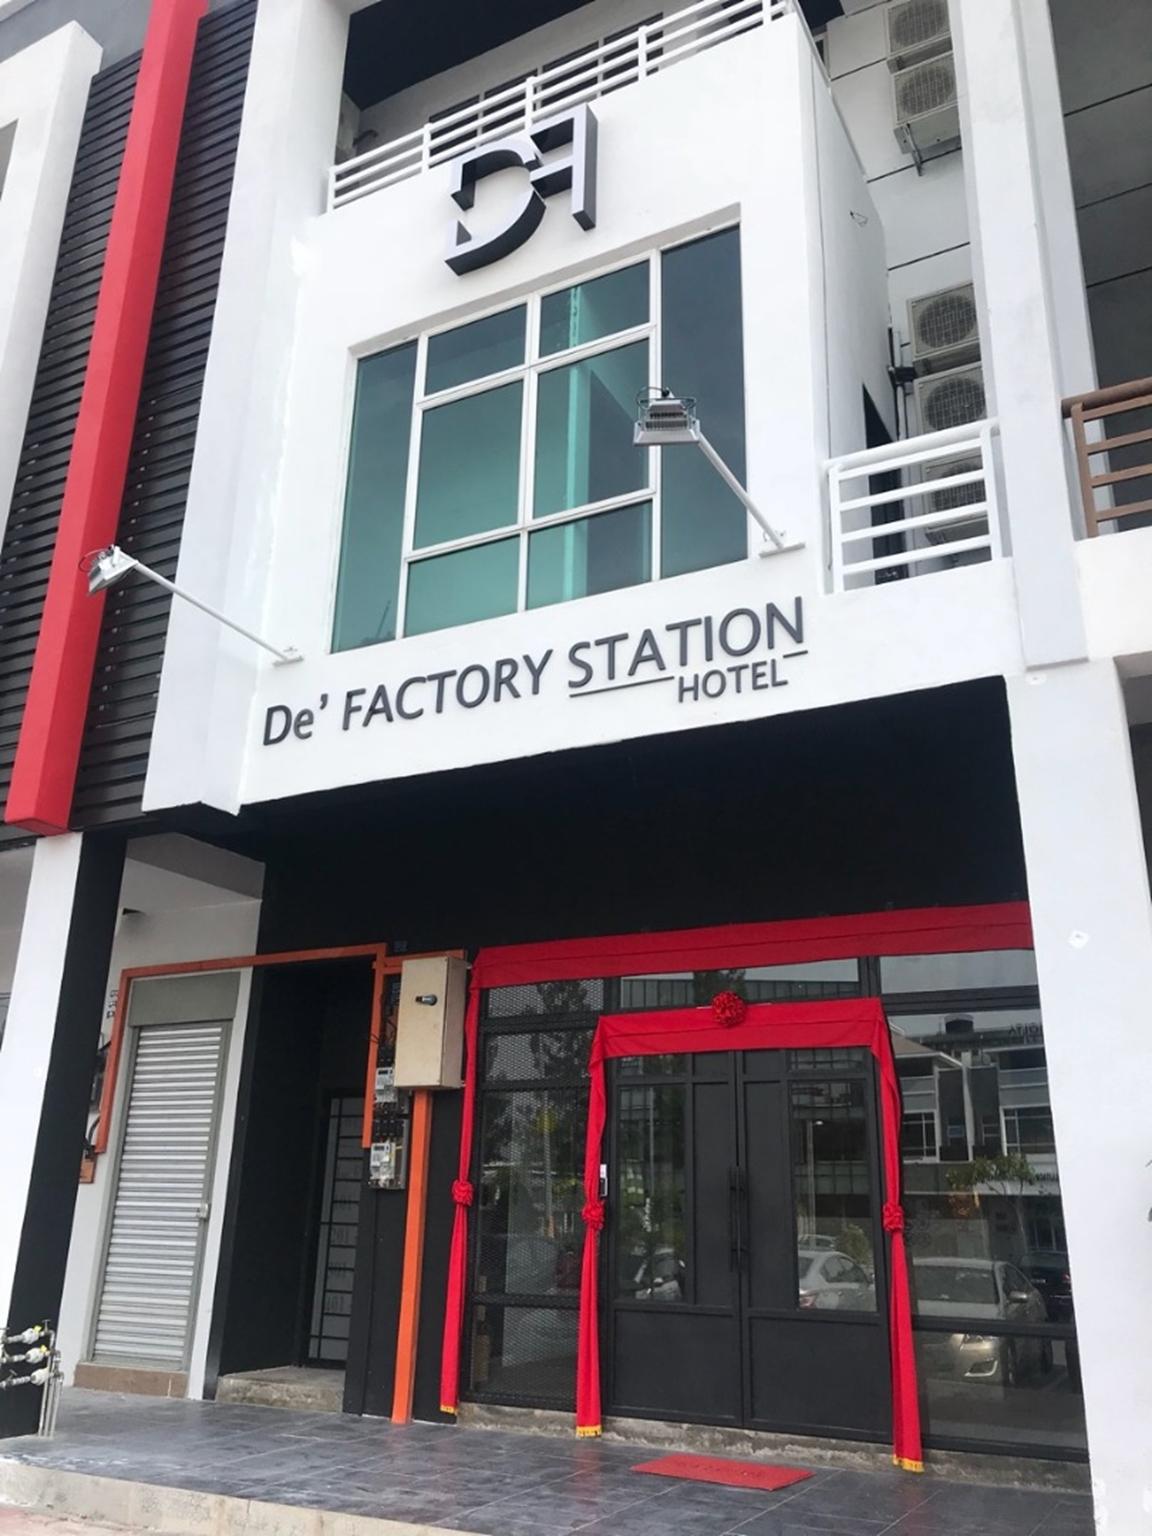 De' Factory Station Hotel & Cafe